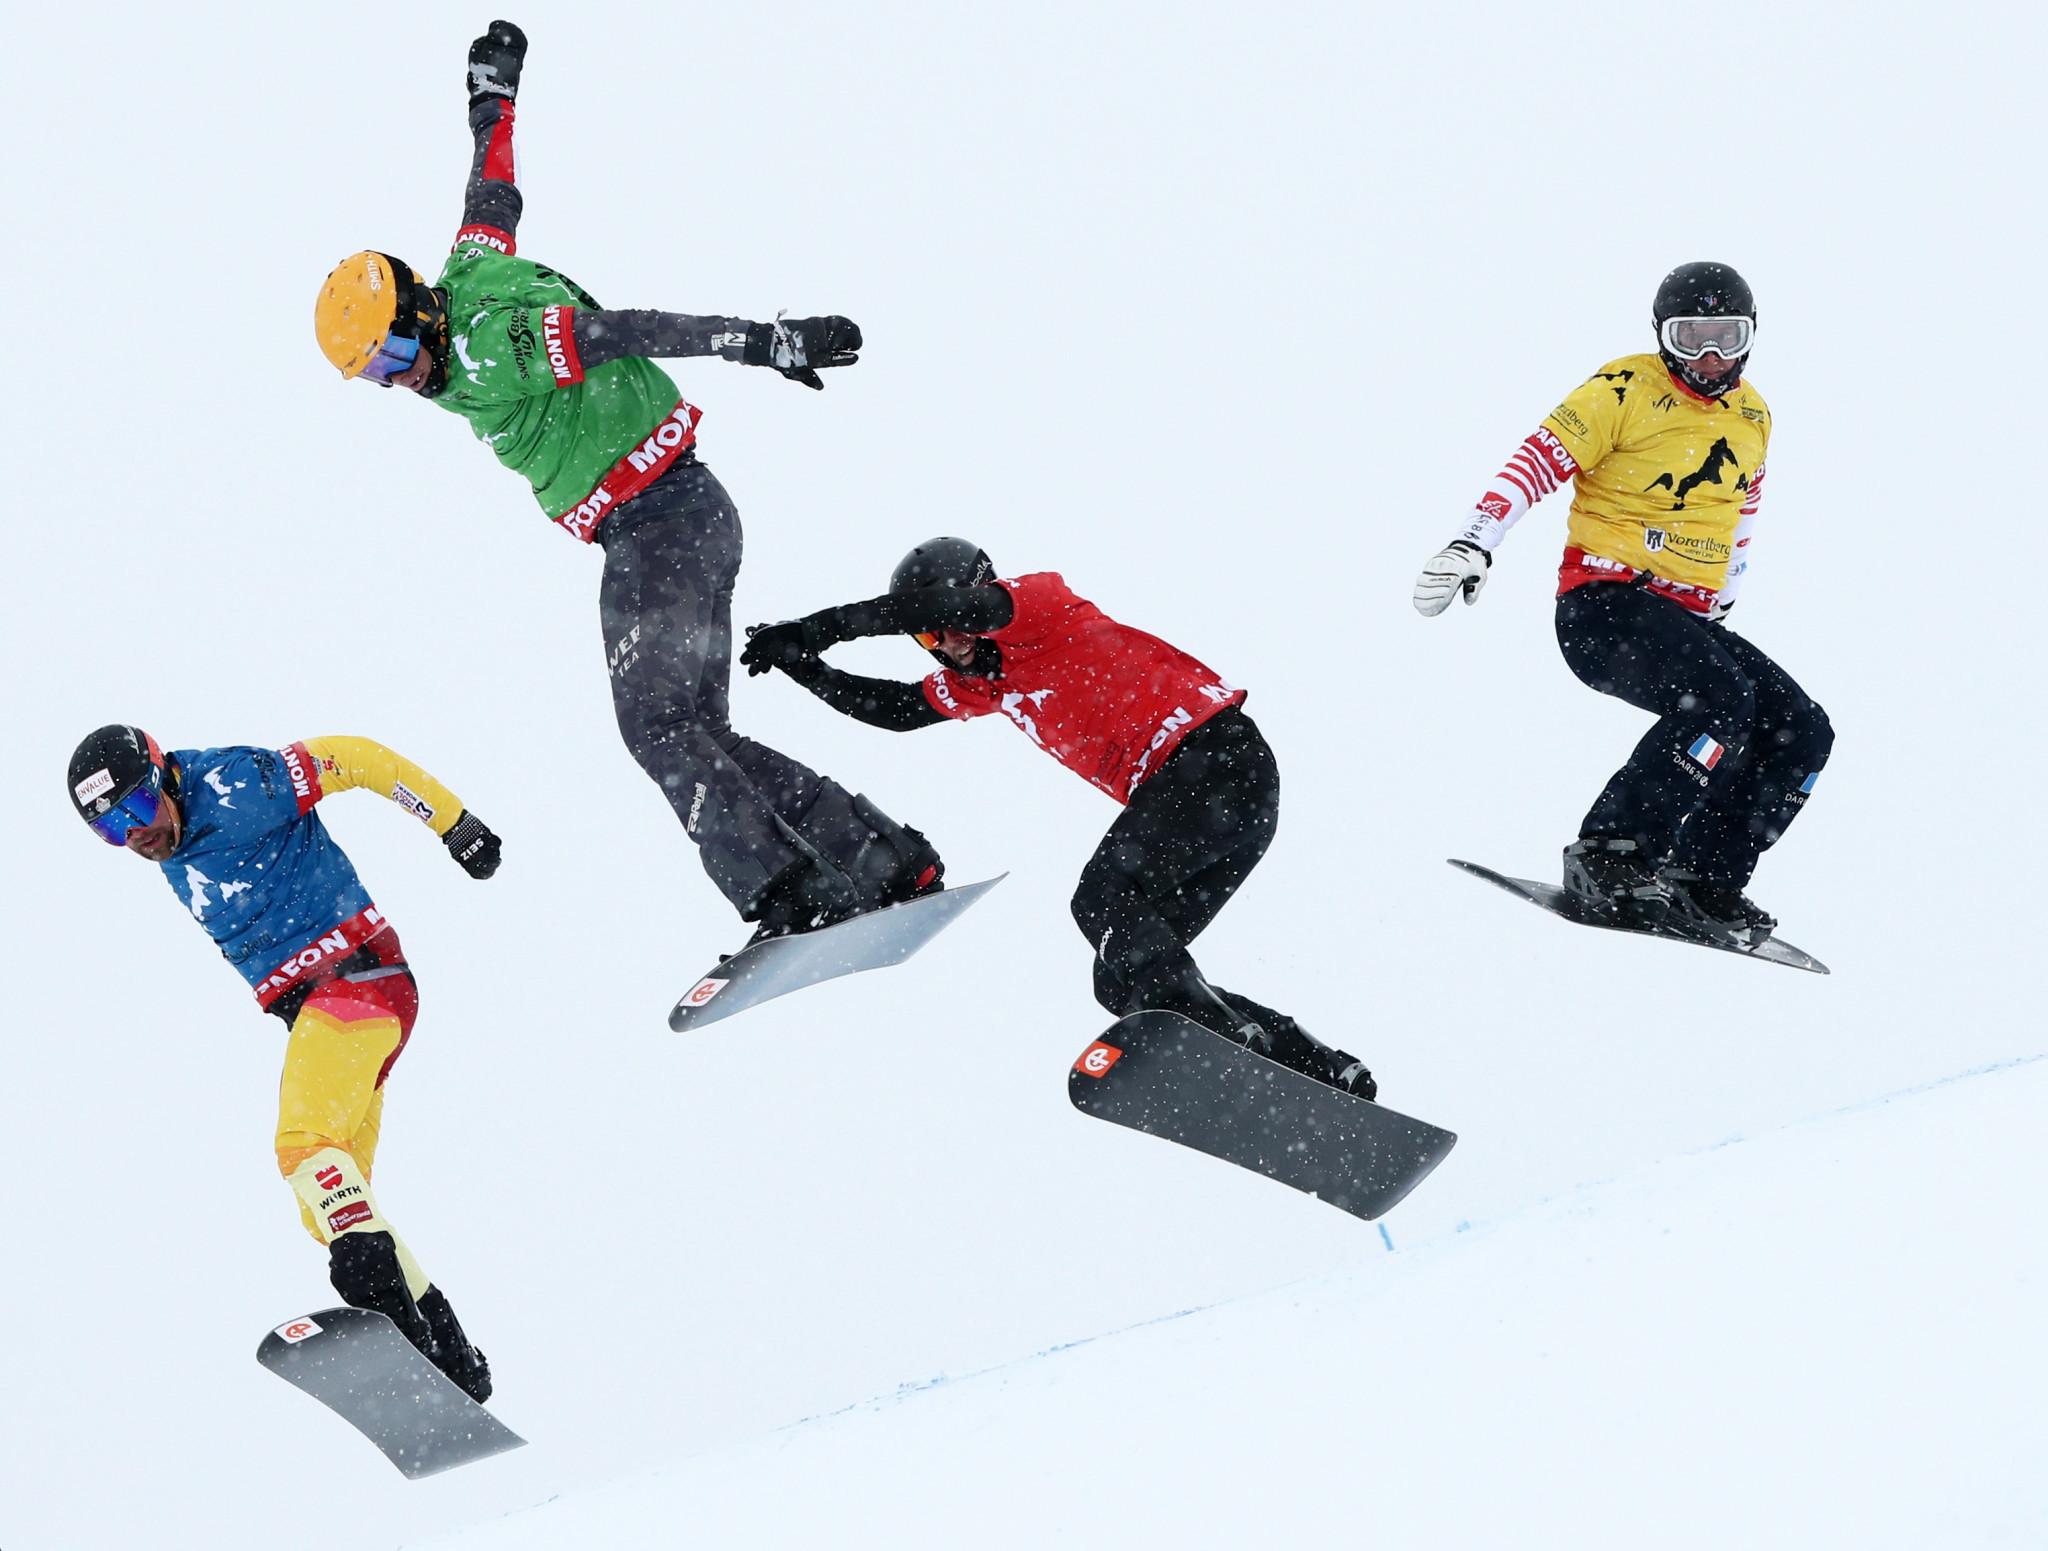 Snowboard Cross World Cup season set for Italian take-off